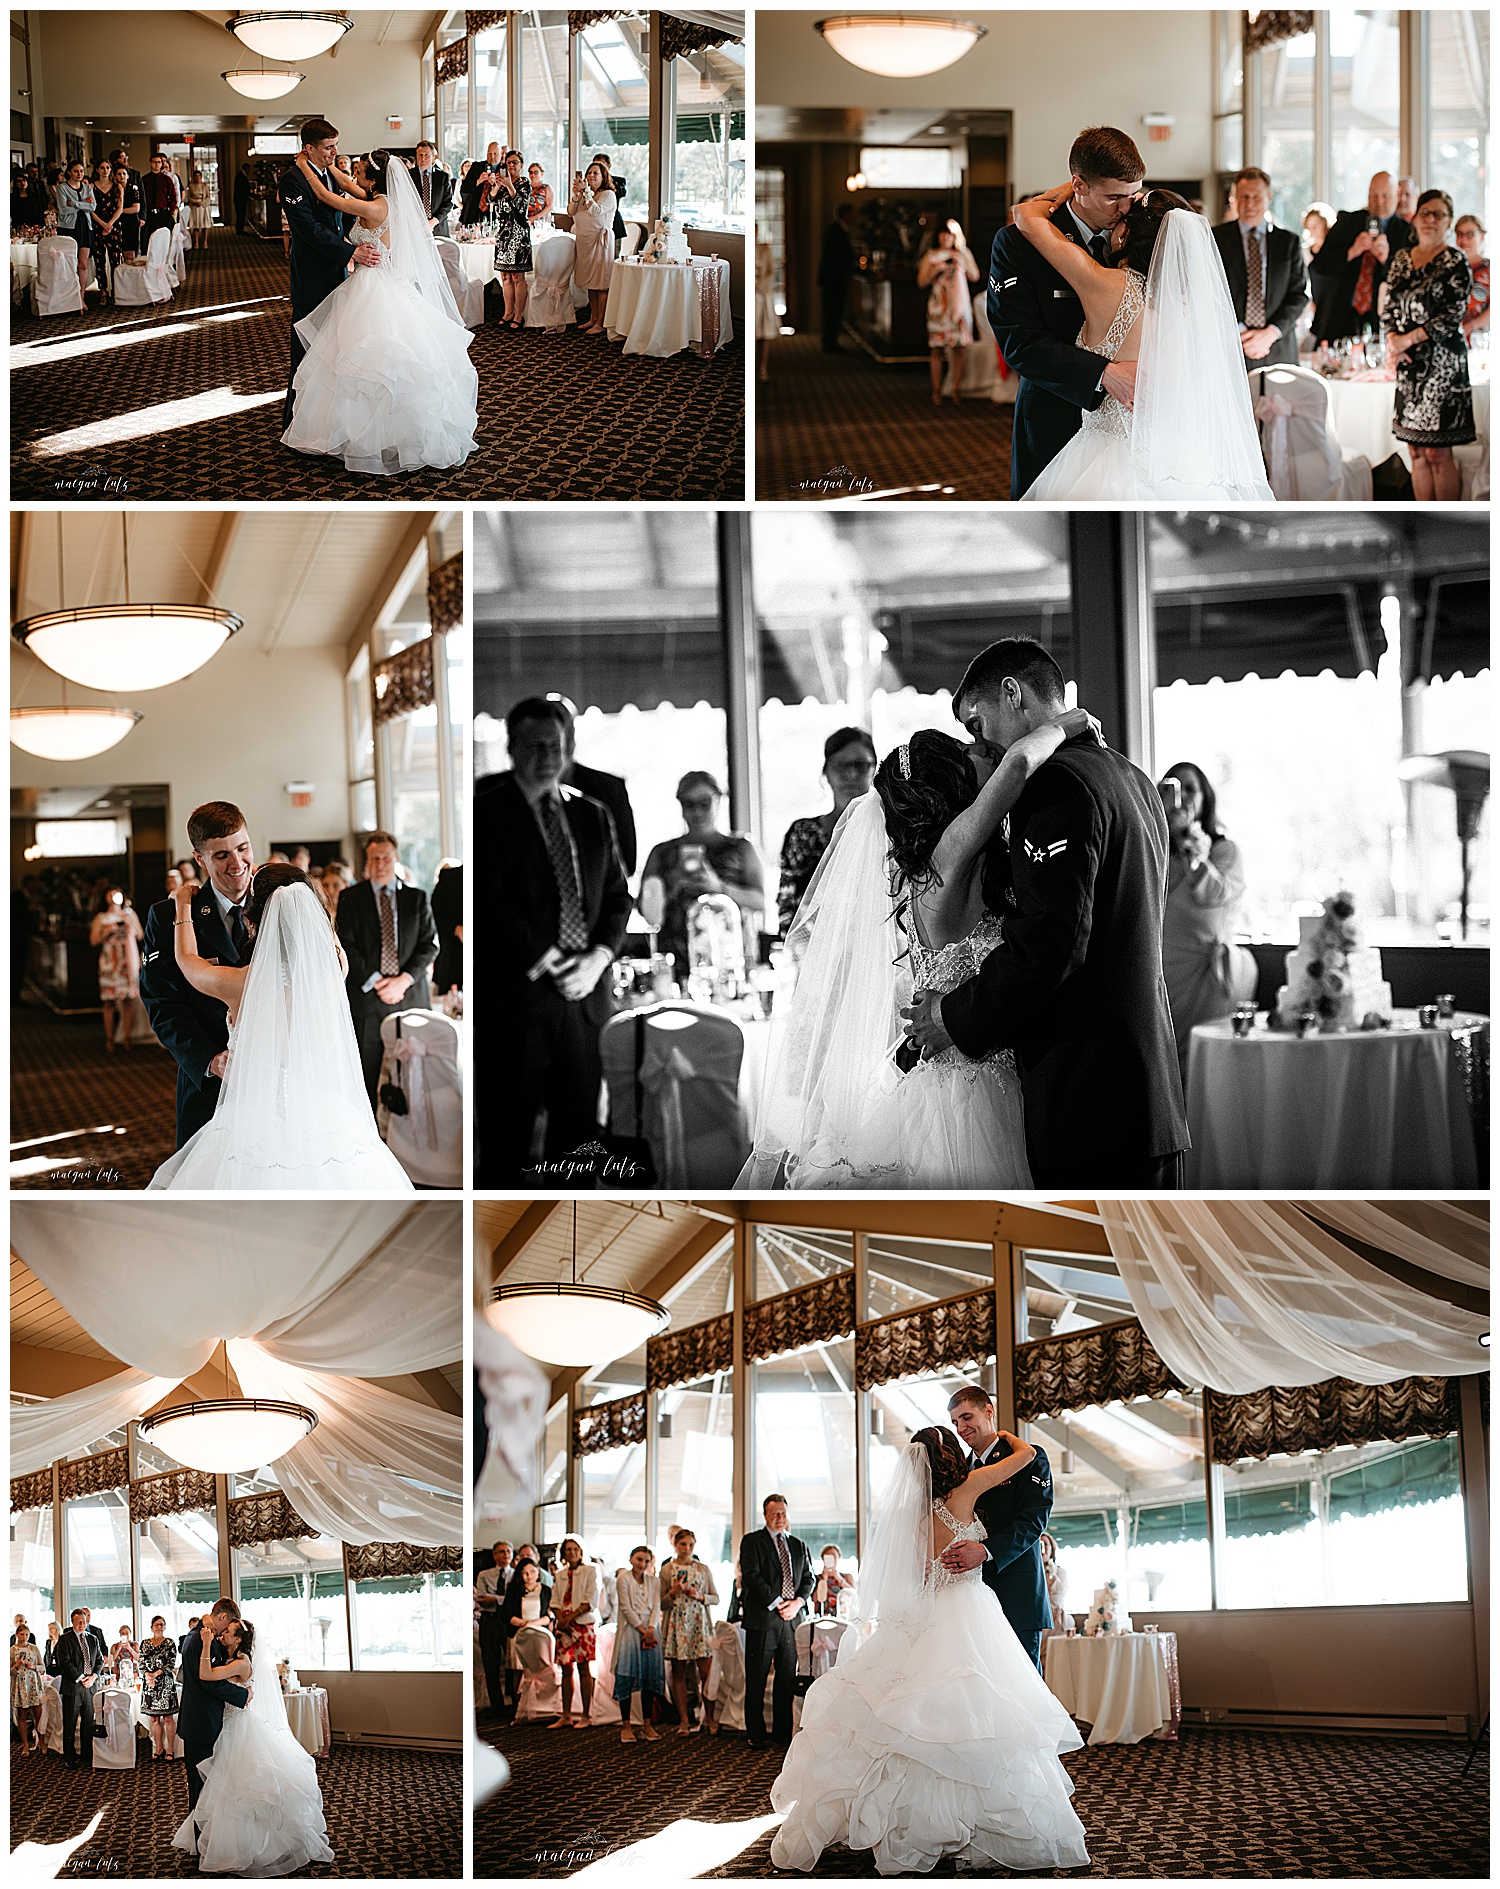 NEPA-Lehigh-Valley-Wedding-Photographer-at-Glen-Oak-Country-Club-Clarks-Summit-PA_0054.jpg